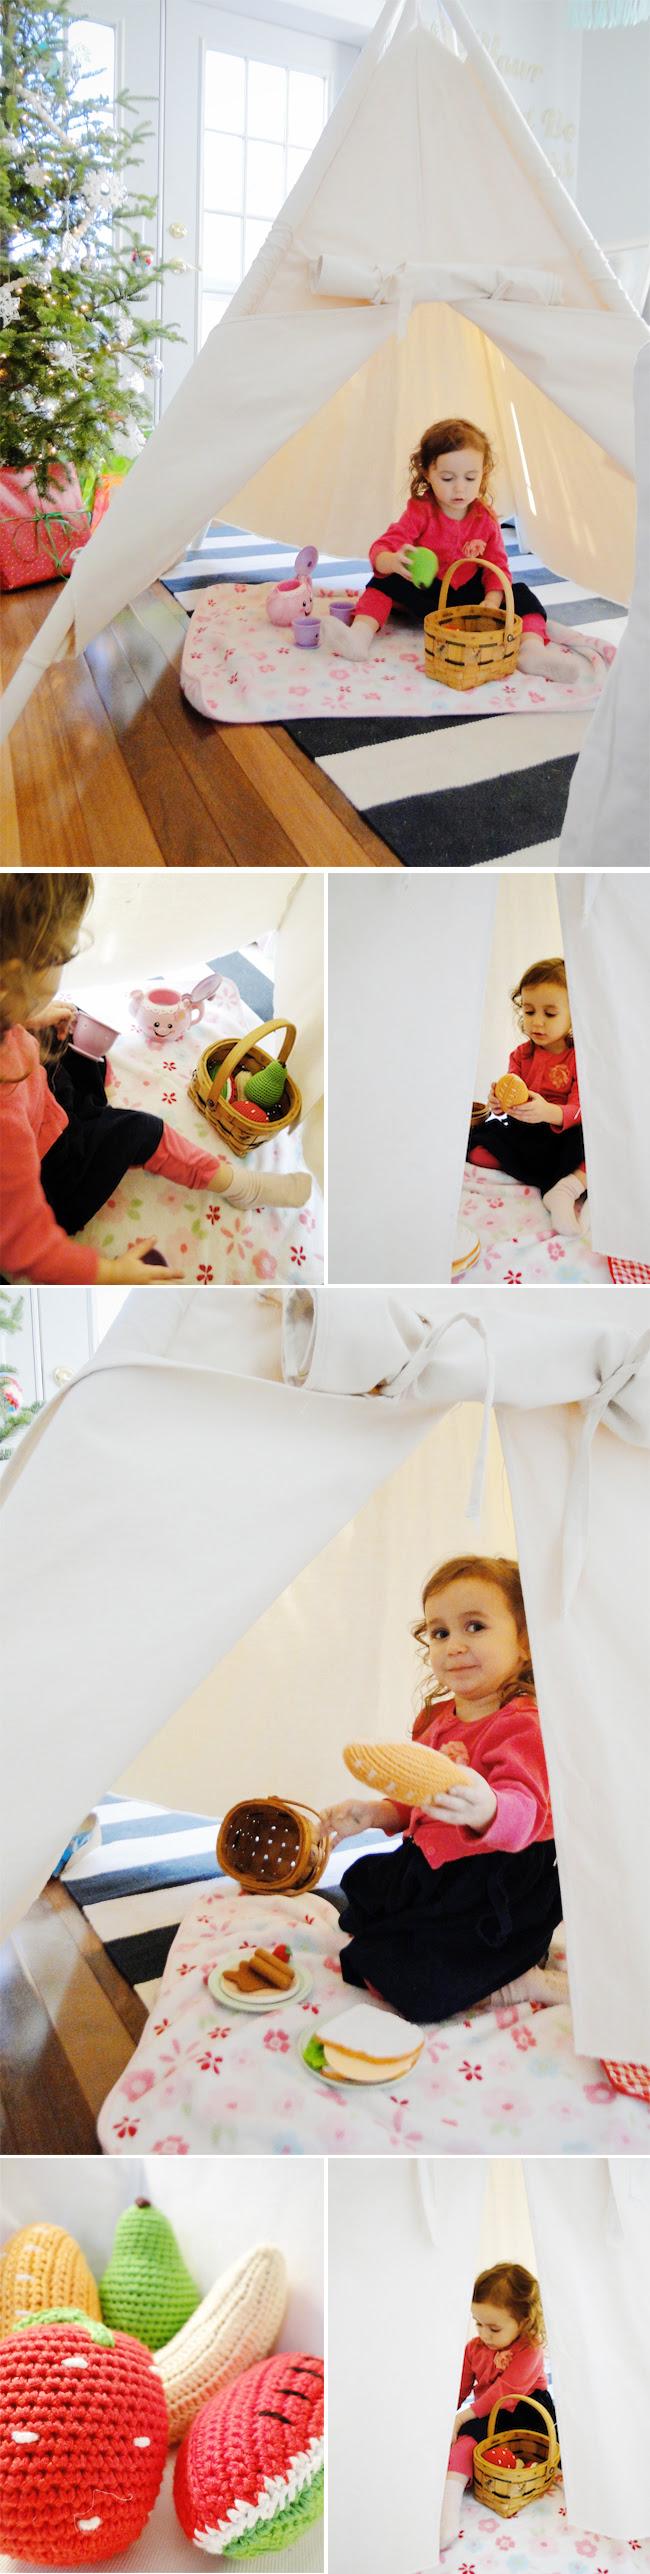 a-lovely-lark-indoor-picnic